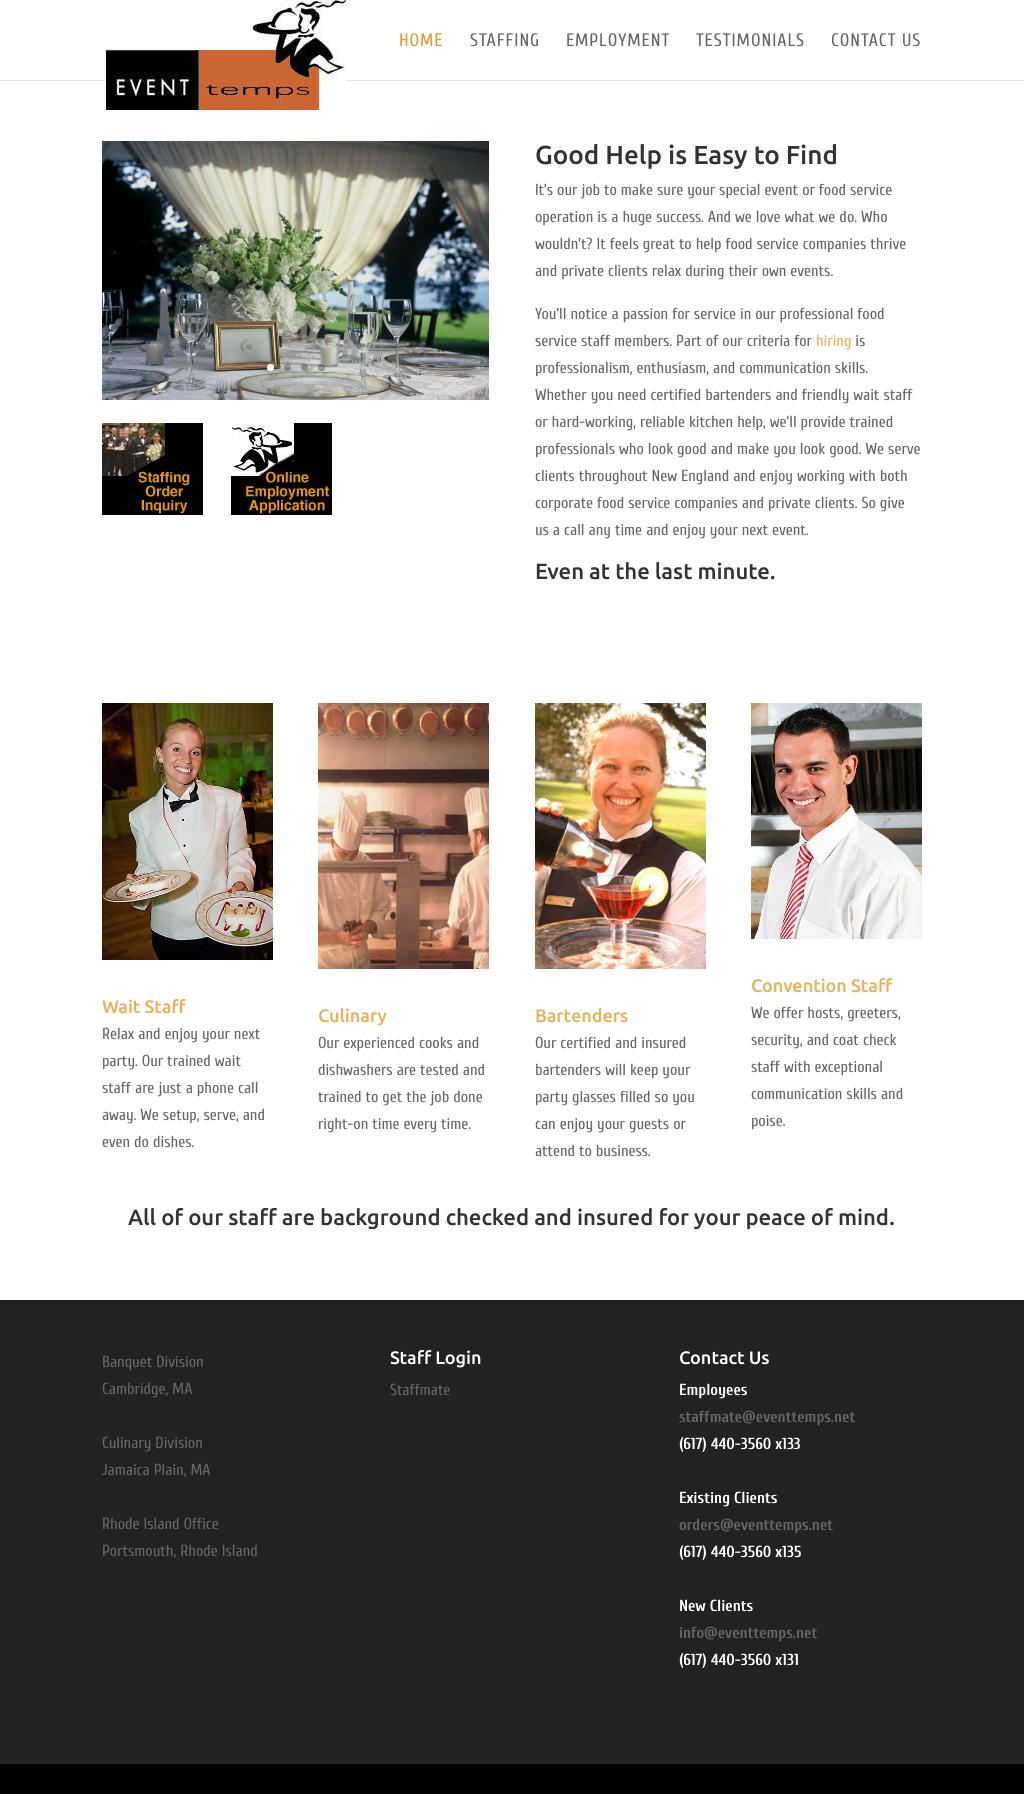 Event Temps Website | Scribendi Digital